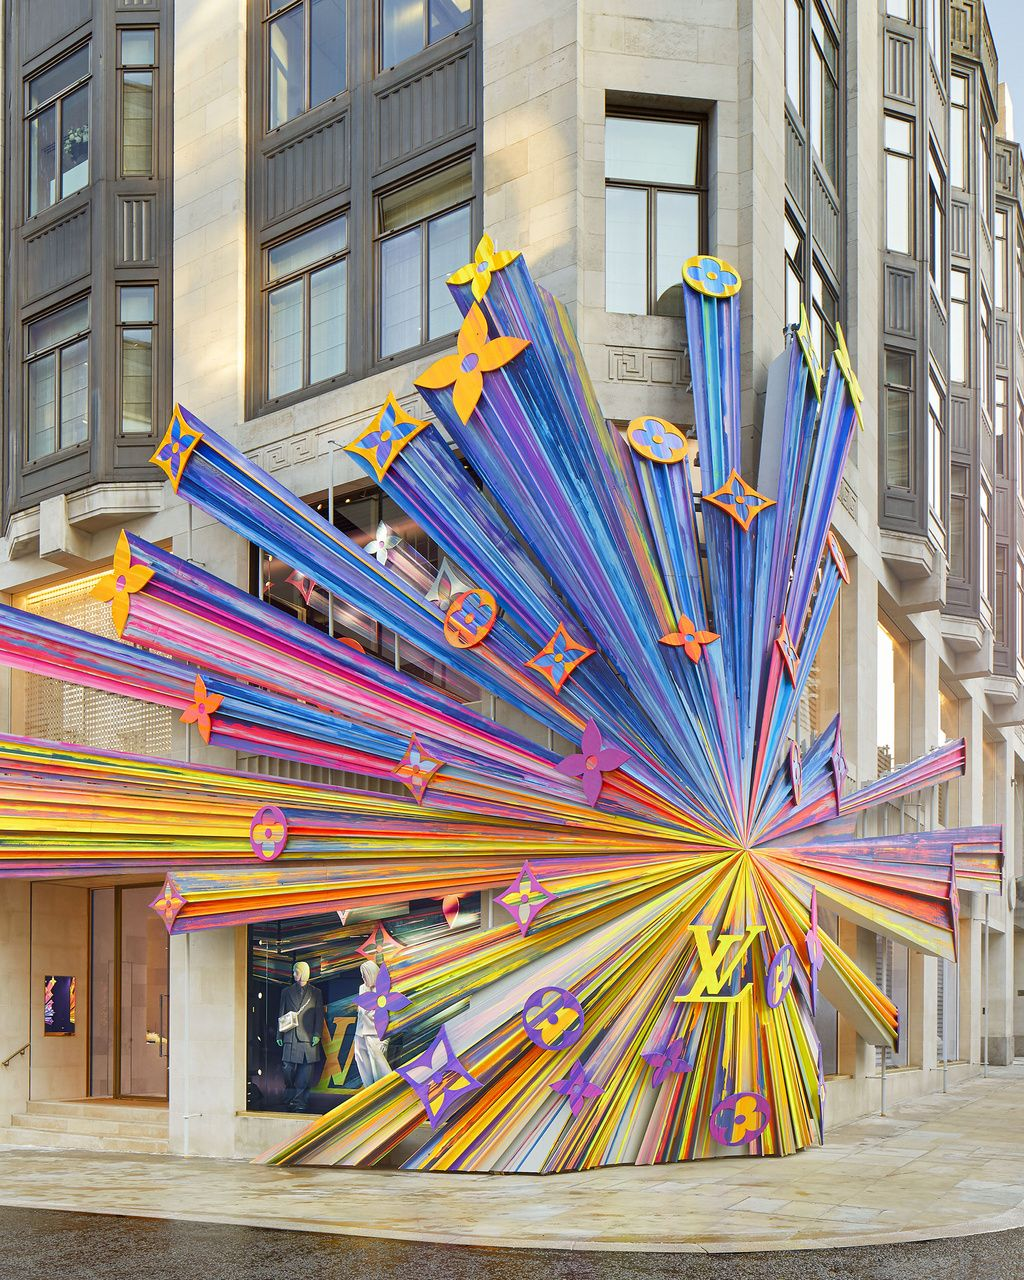 LOUIS VUITTON - New Bond Street store in London